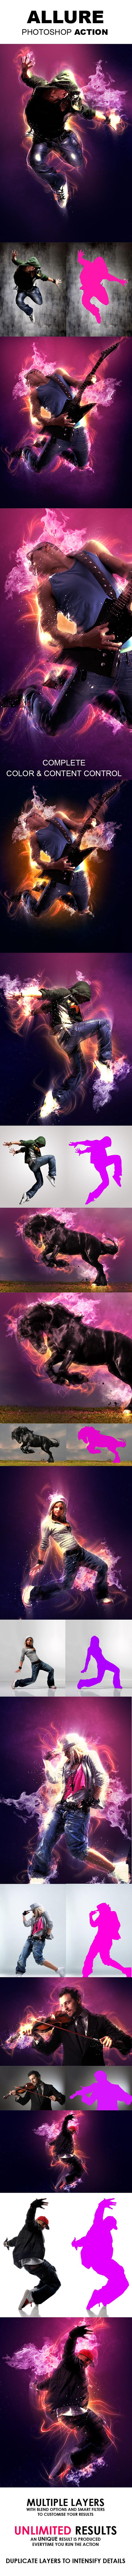 GraphicRiver Allure Photoshop Action 11215239